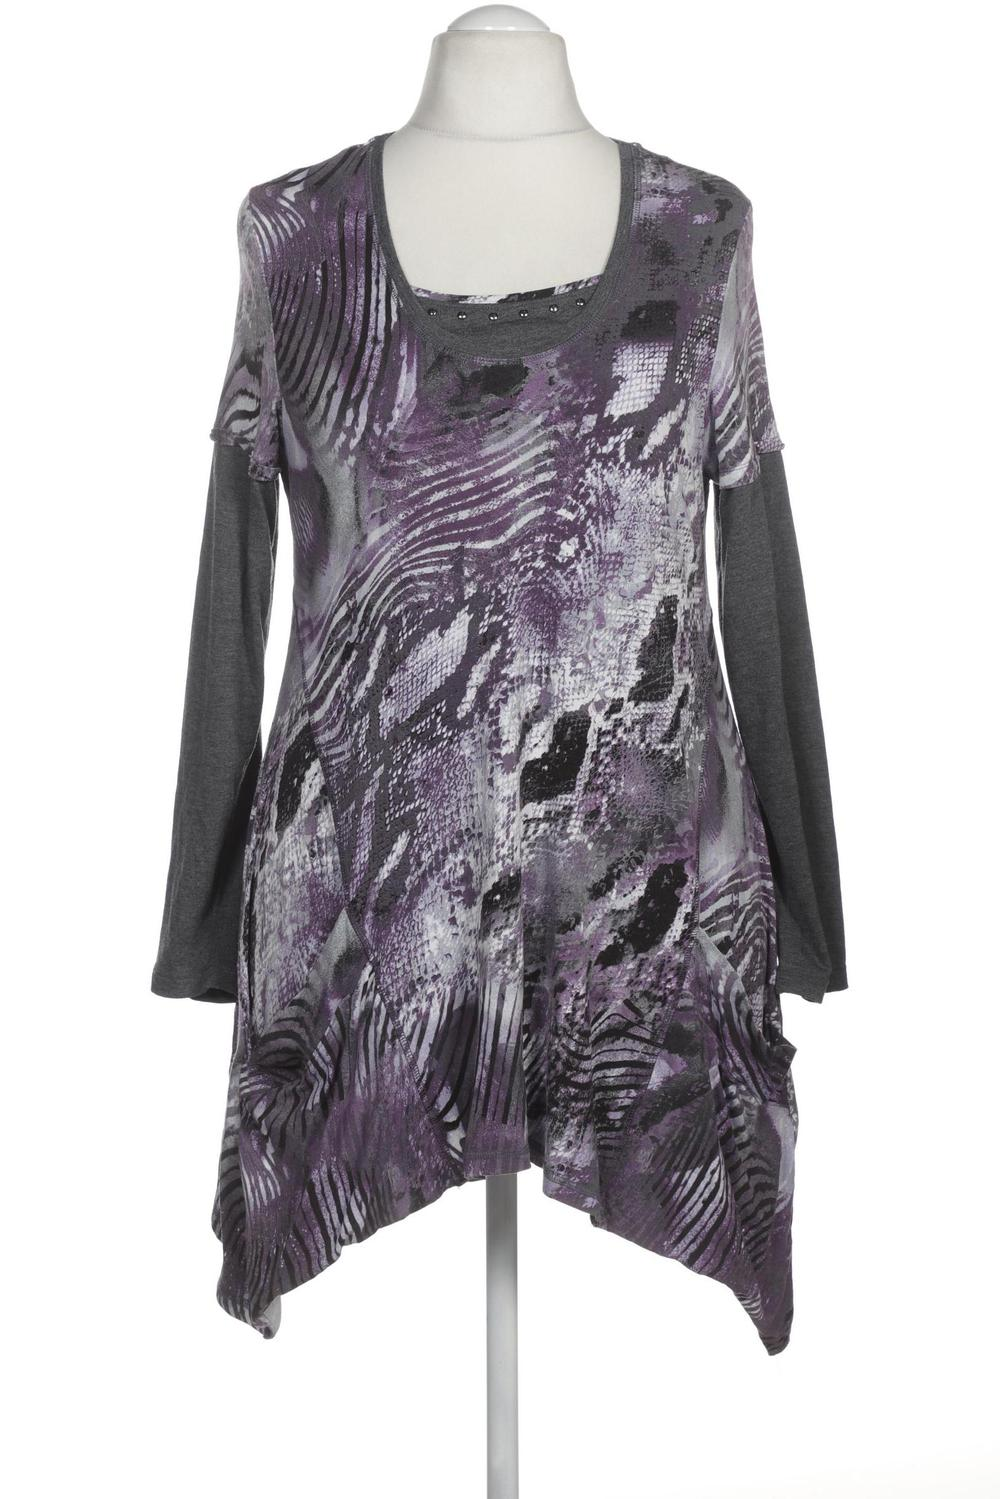 Details zu Bonita Kleid Damen Dress Damenkleid Gr. XL Elasthan Viskose lila  #c16eb16